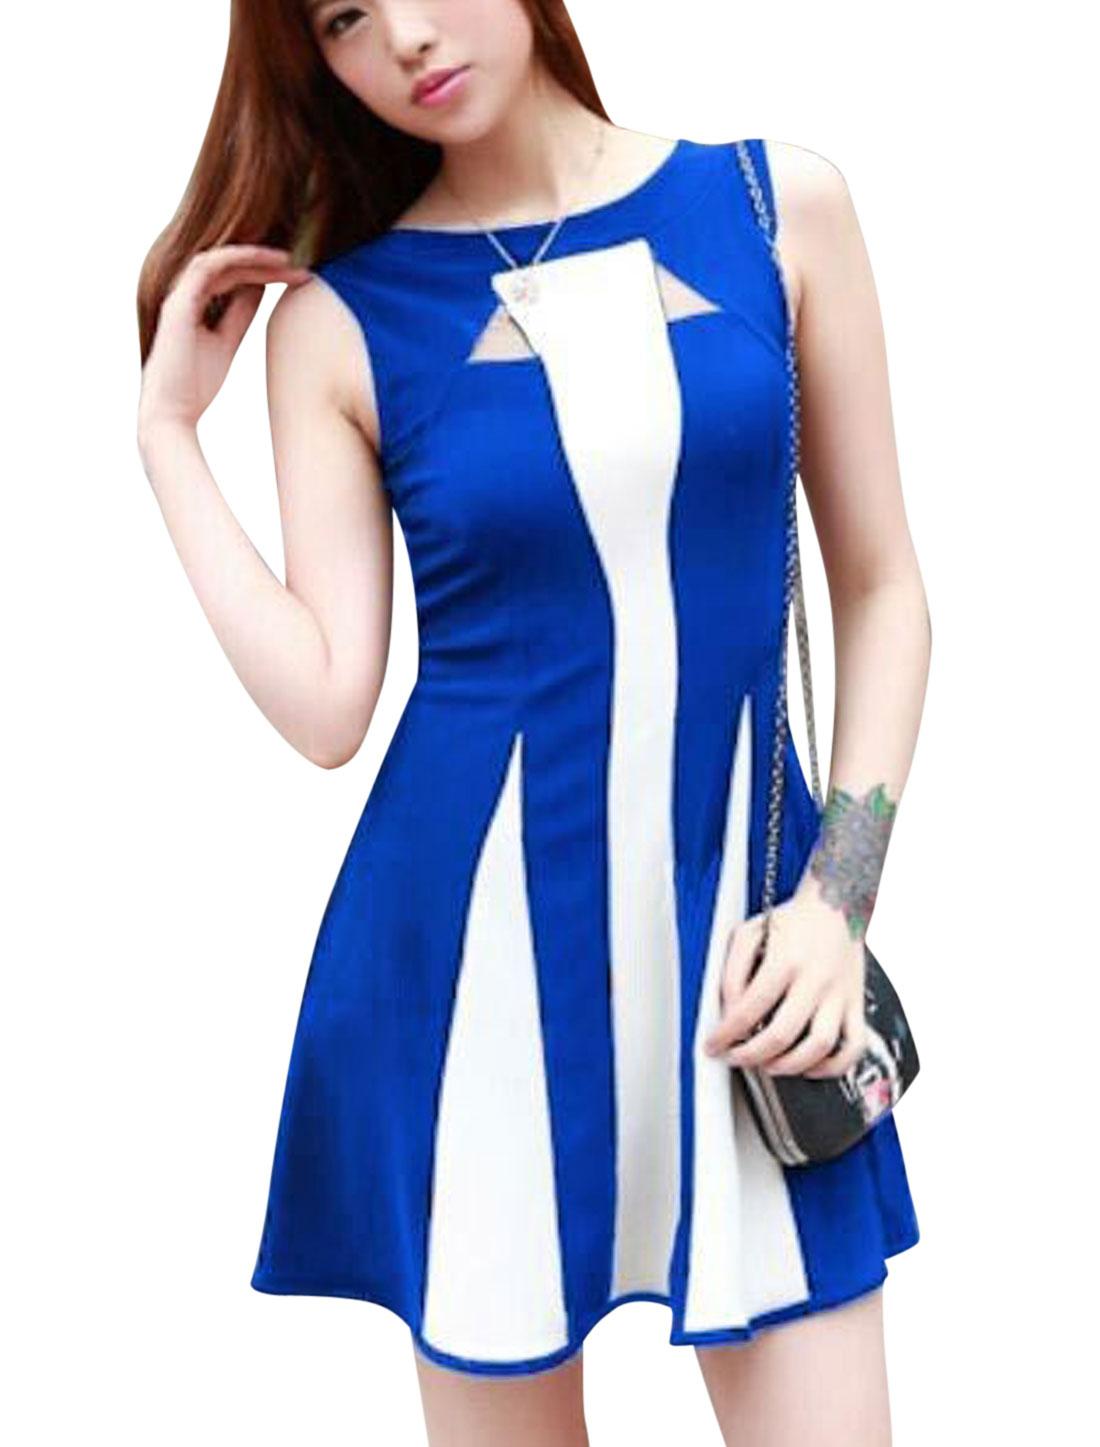 Lady Round Neck Sleeveless Mesh Panel Colorblock Dress Royal Blue XS